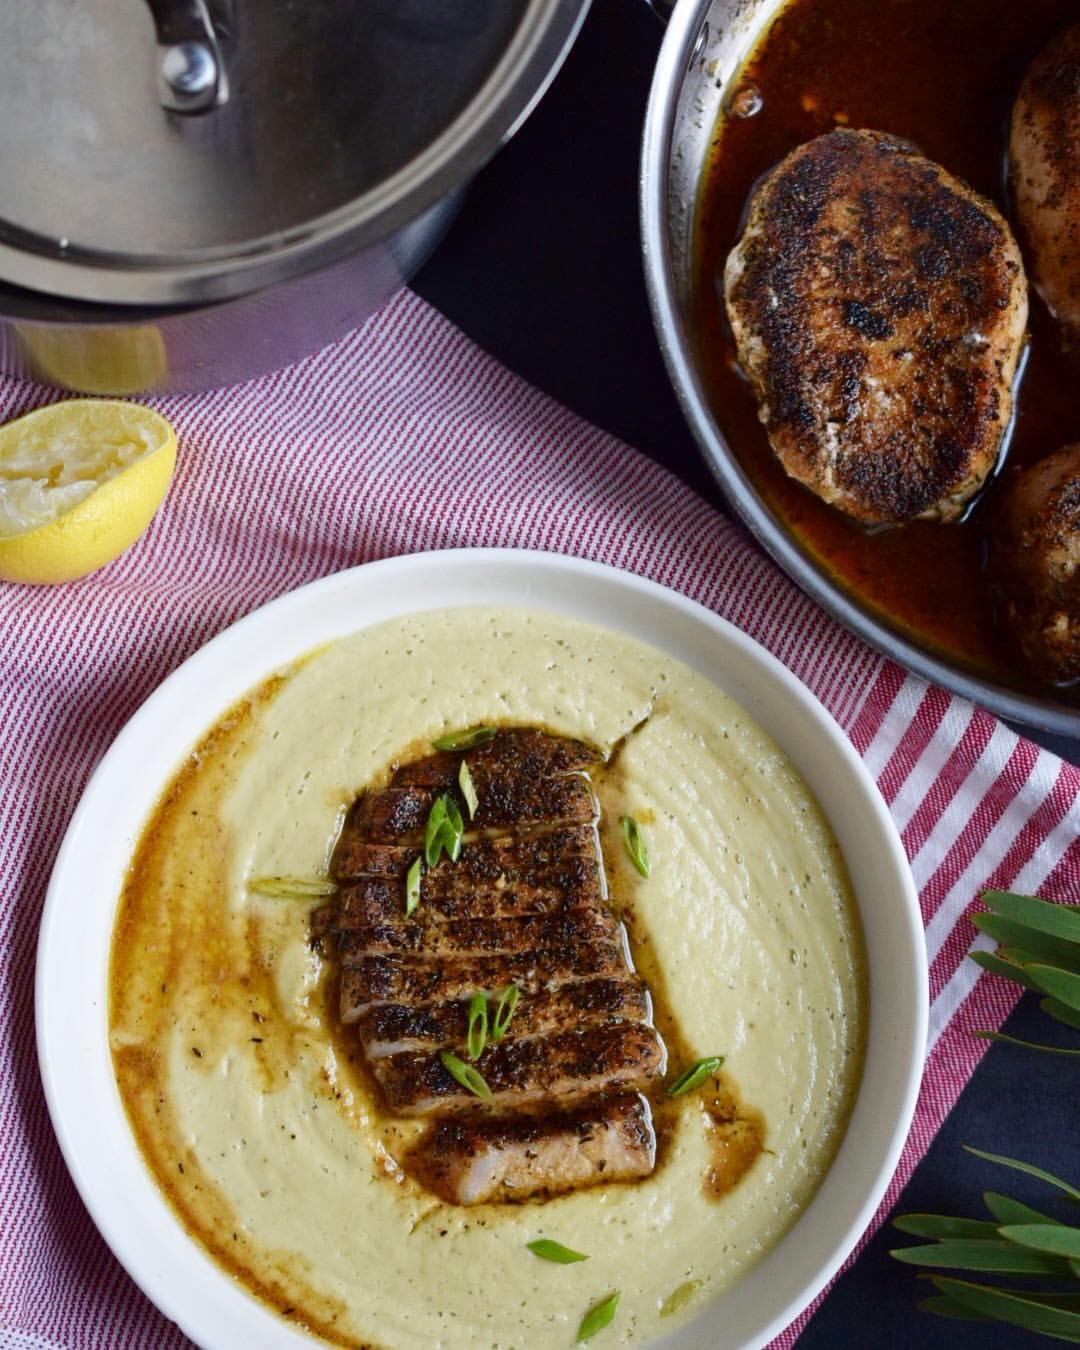 Pork Chop & Cauliflower Purée